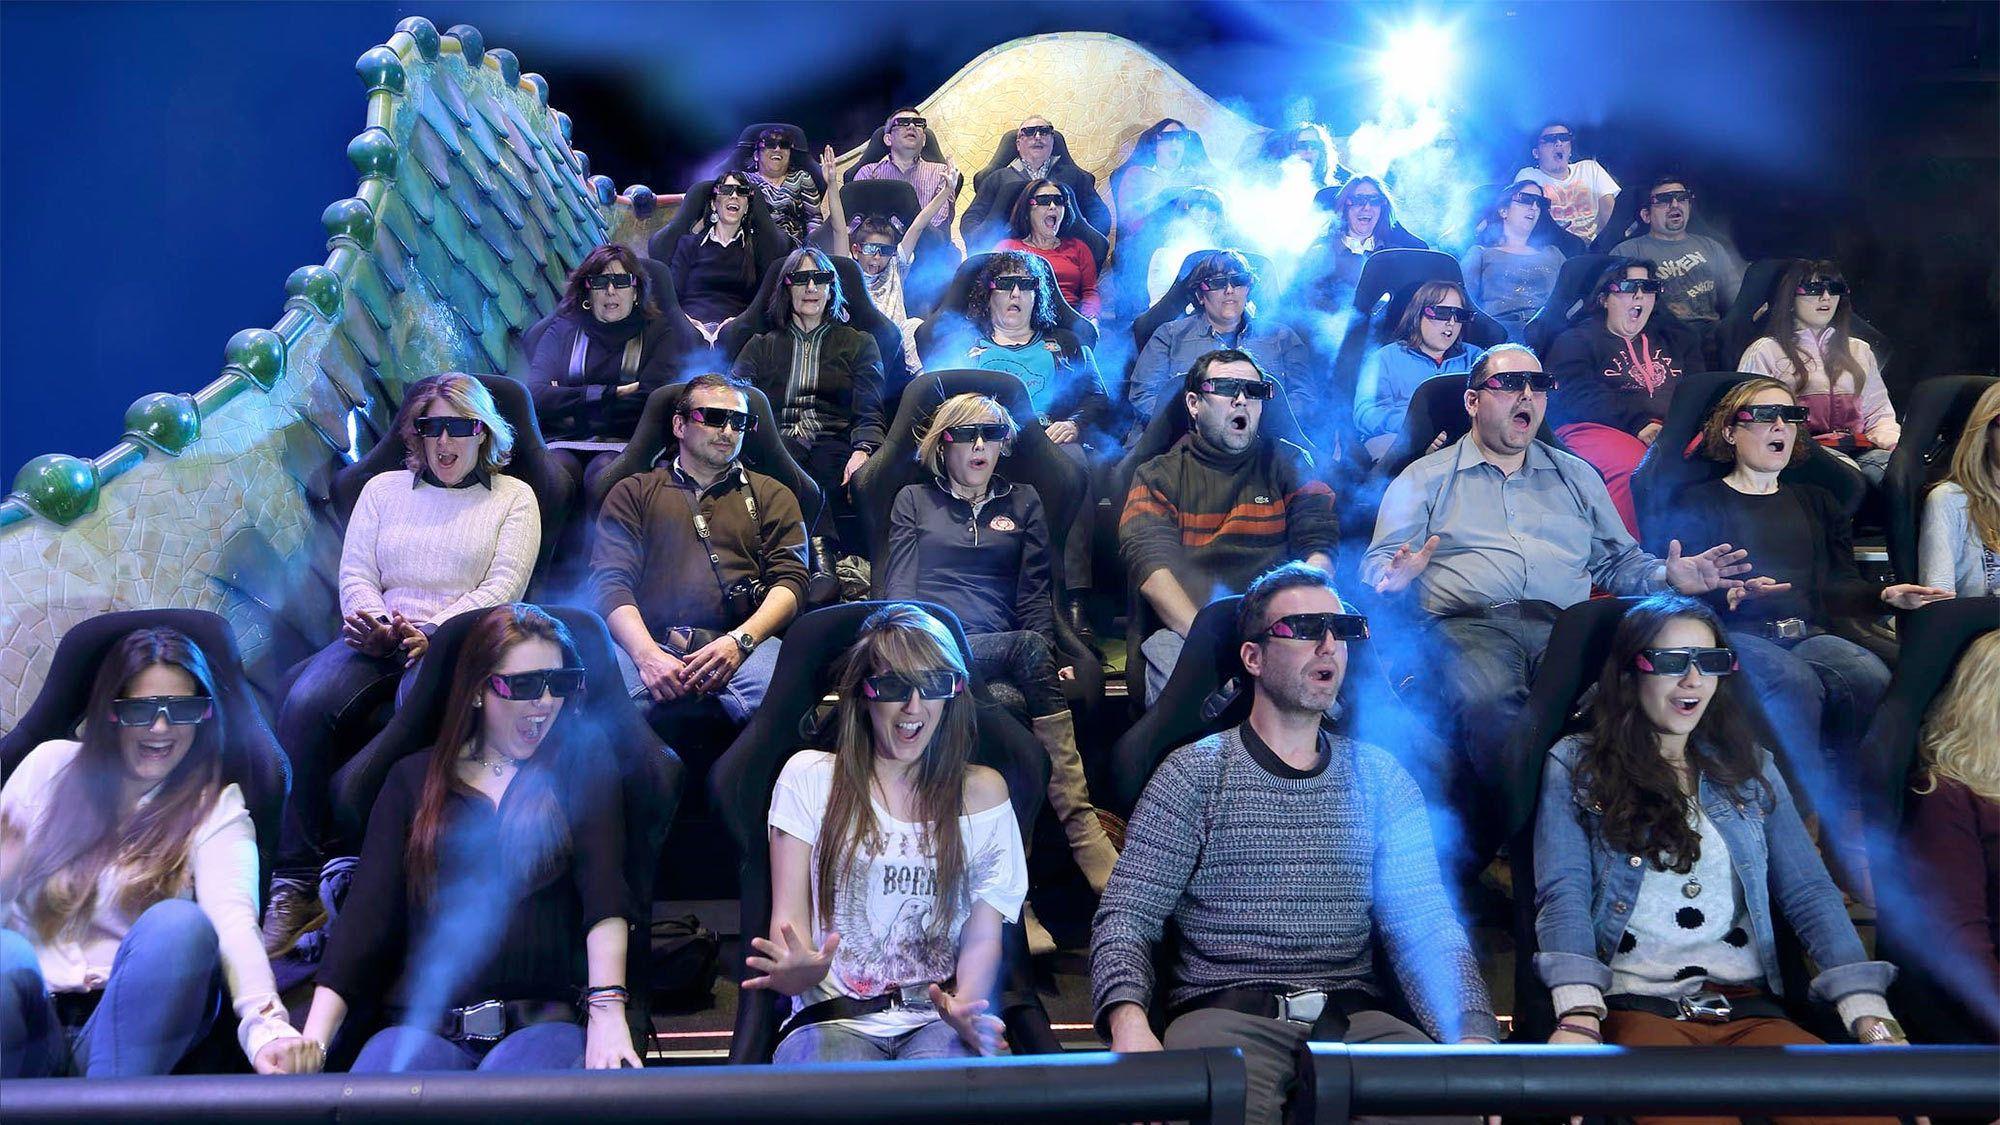 Gaudí Experiència Tickets with 4D Experience